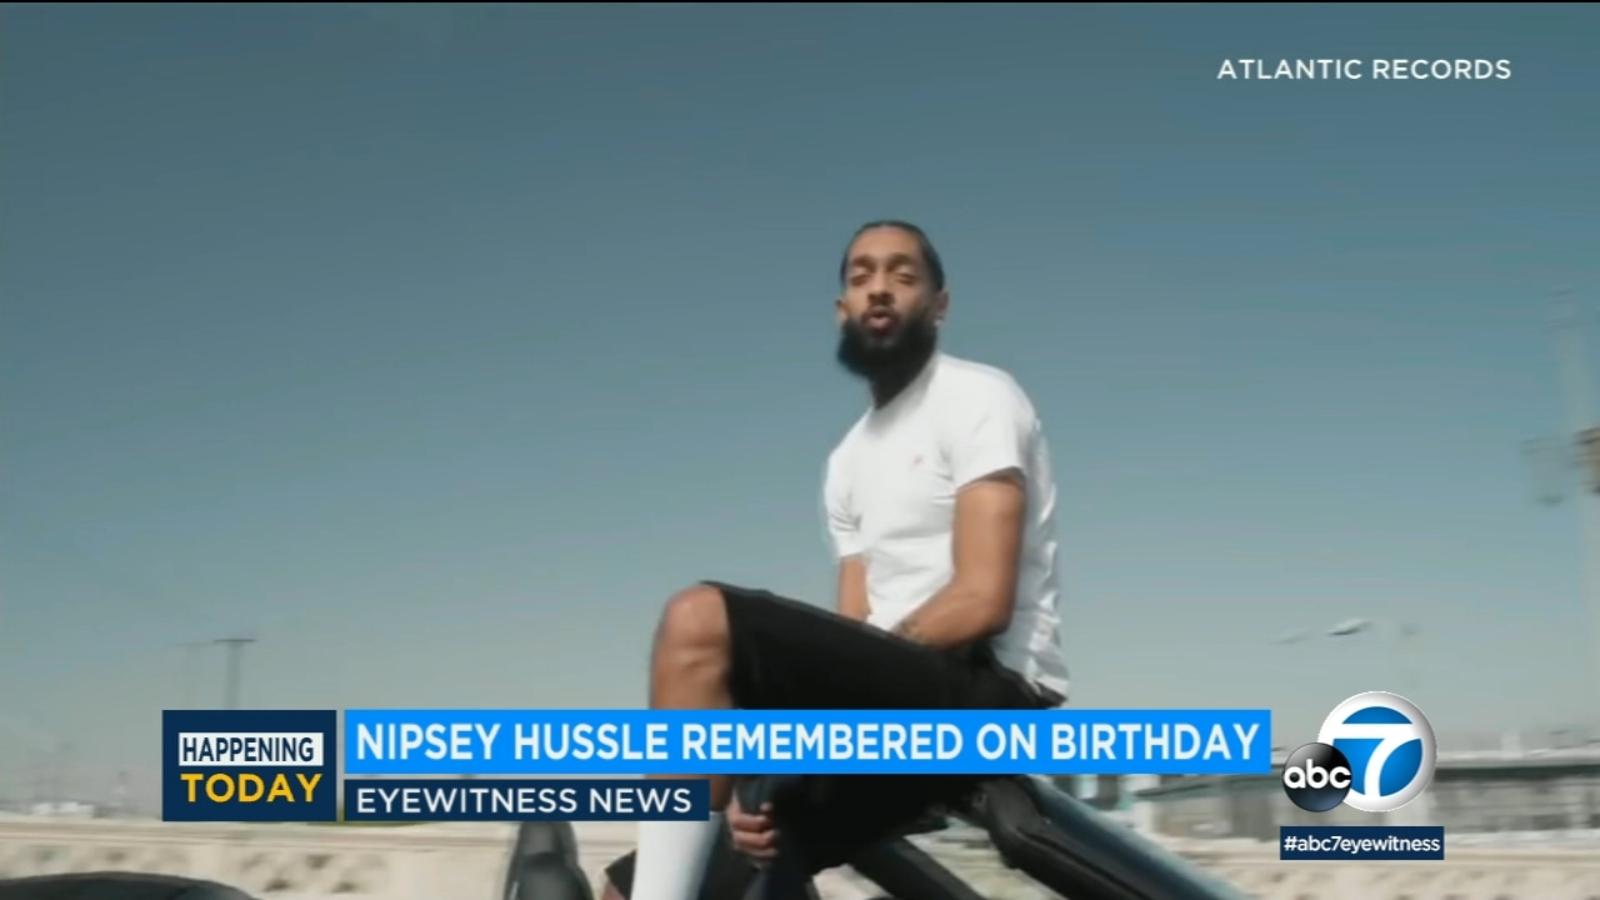 Slain rapper Nipsey Hussle remembered on his birthday